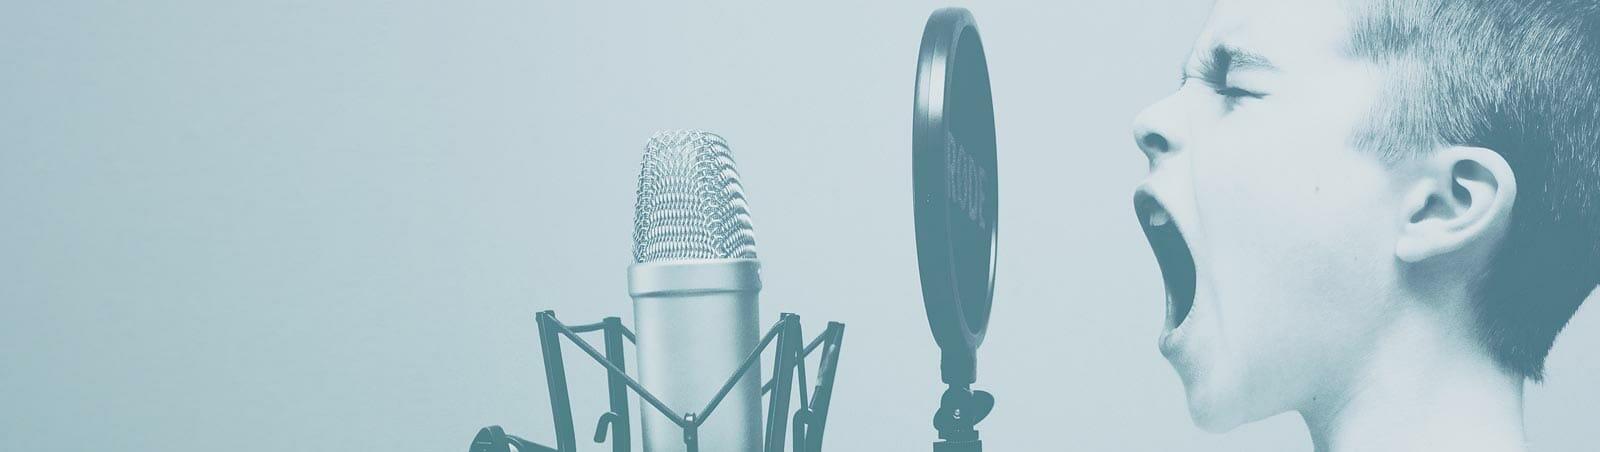 Tools für die Online-Kommunikation – tinkla.com